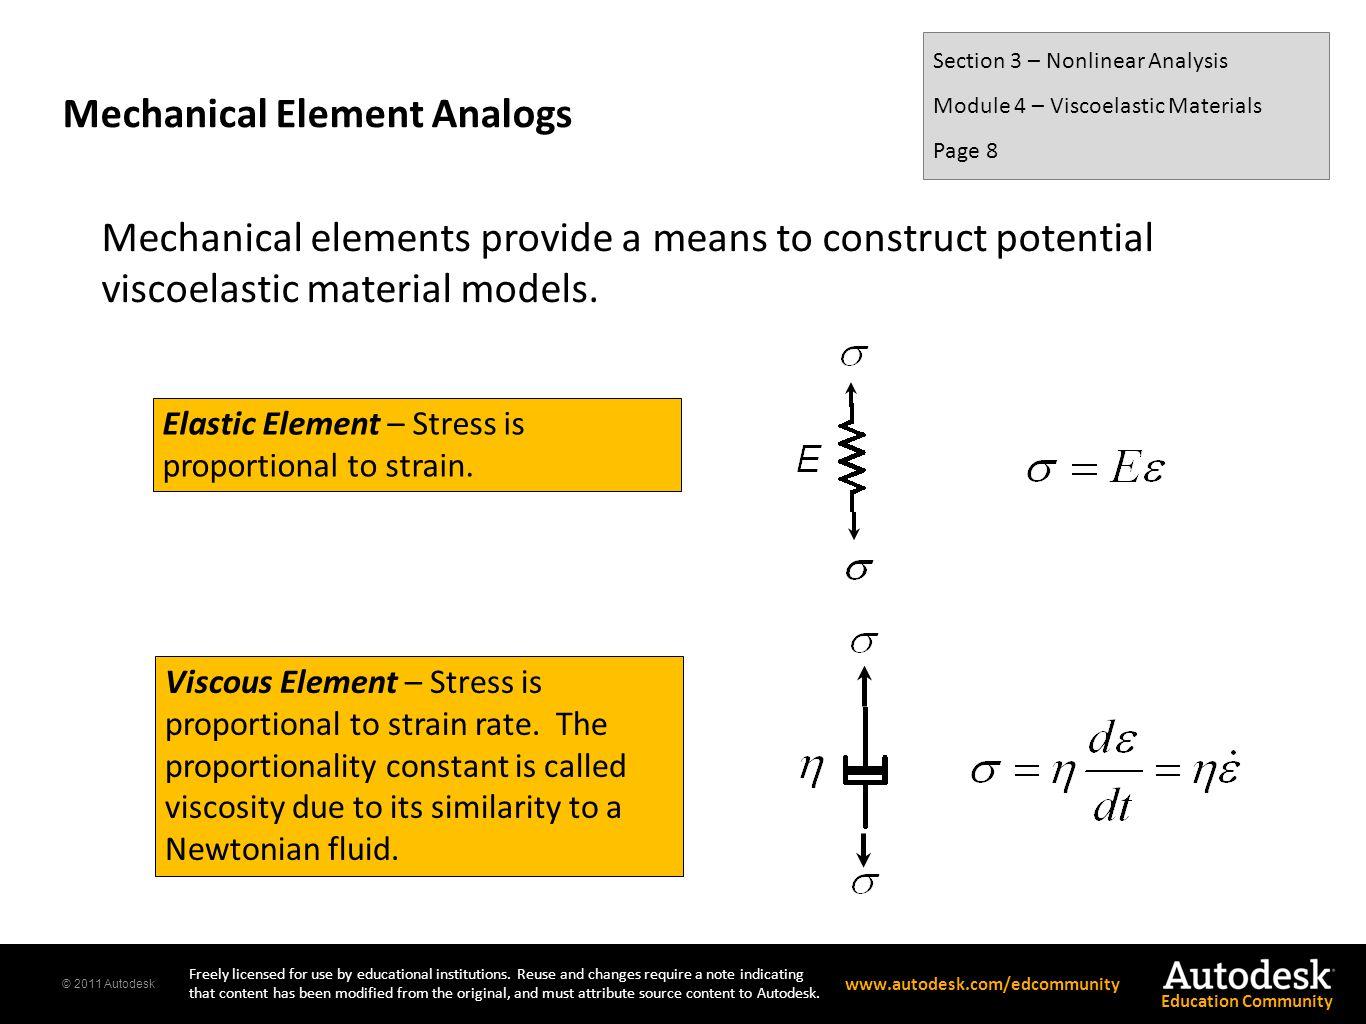 Mechanical Element Analogs